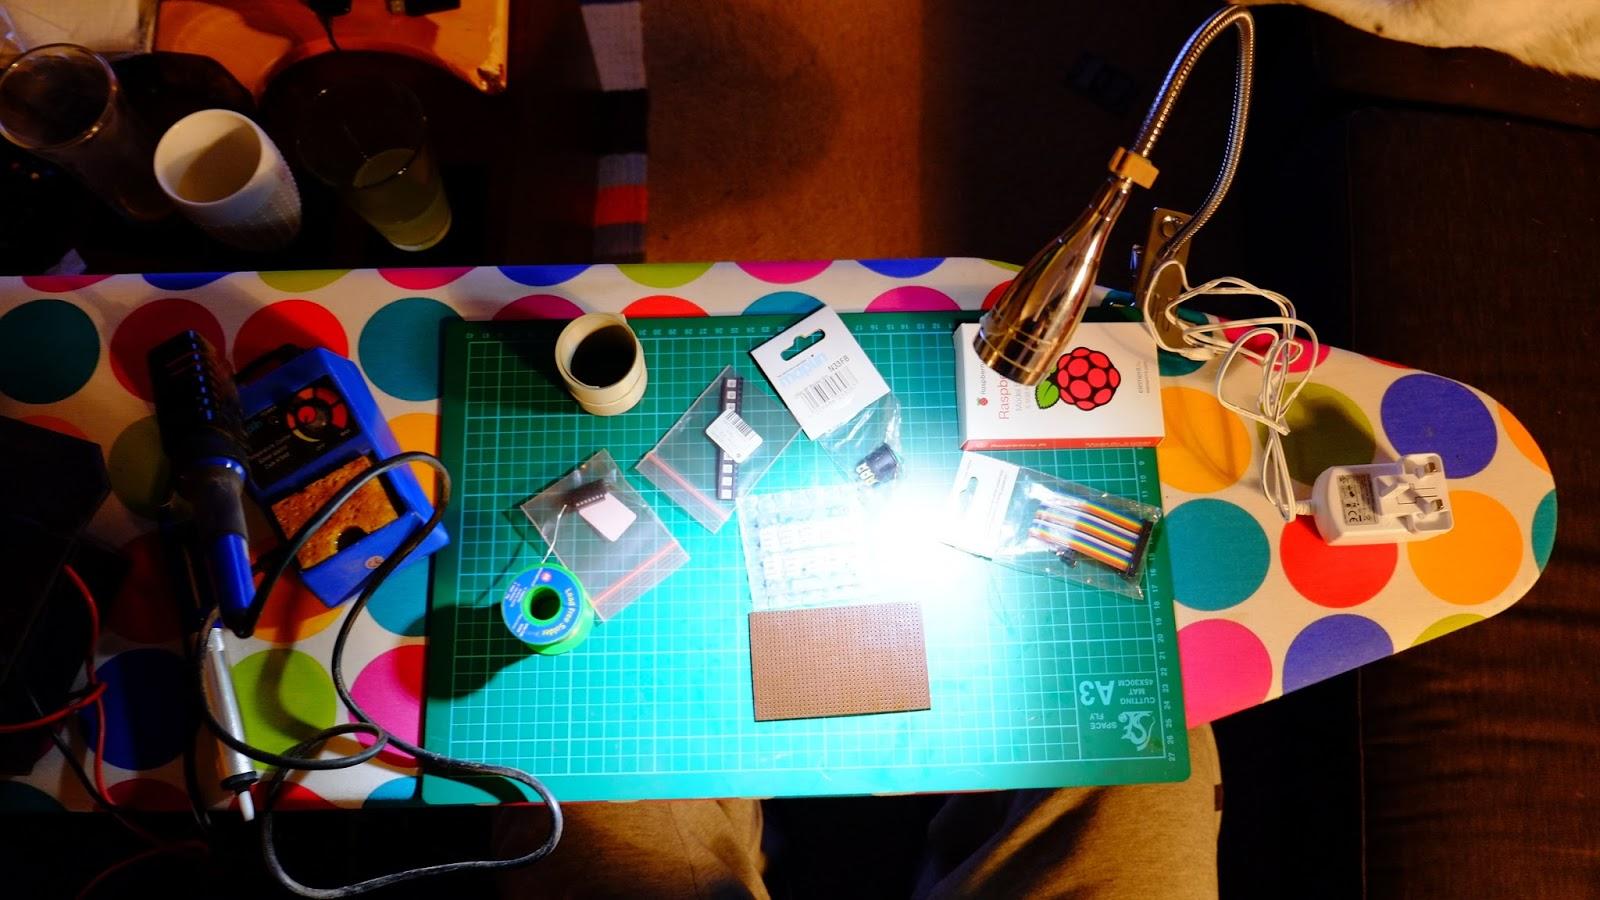 Dotstar Design Arduino 82158 Led Matrix Shinium Brilliance By